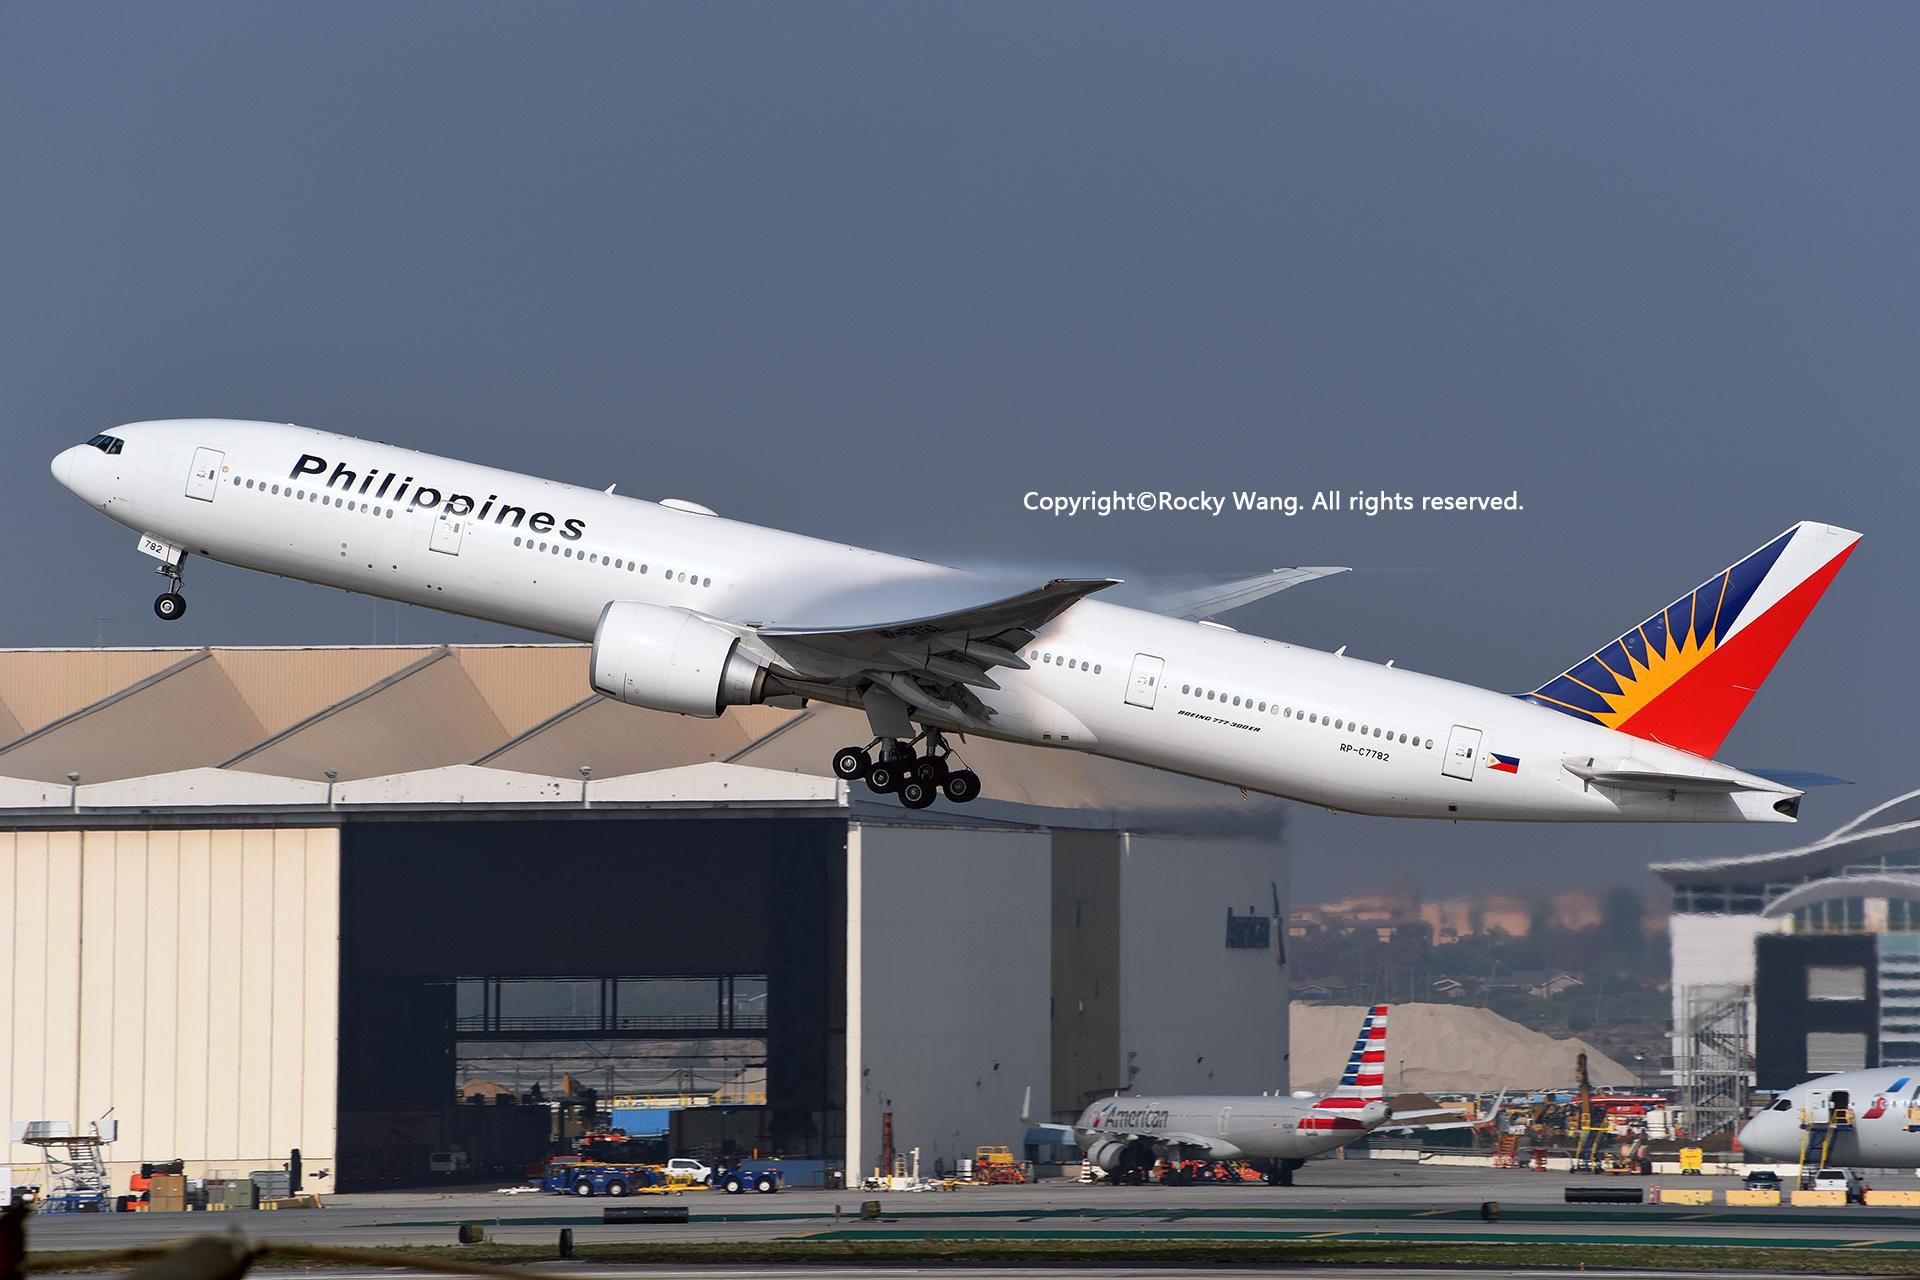 Re:[原创]随便来一组 不凑30图了 BOEING 777-3F6ER RP-C7782 Los Angeles Int'l Airport